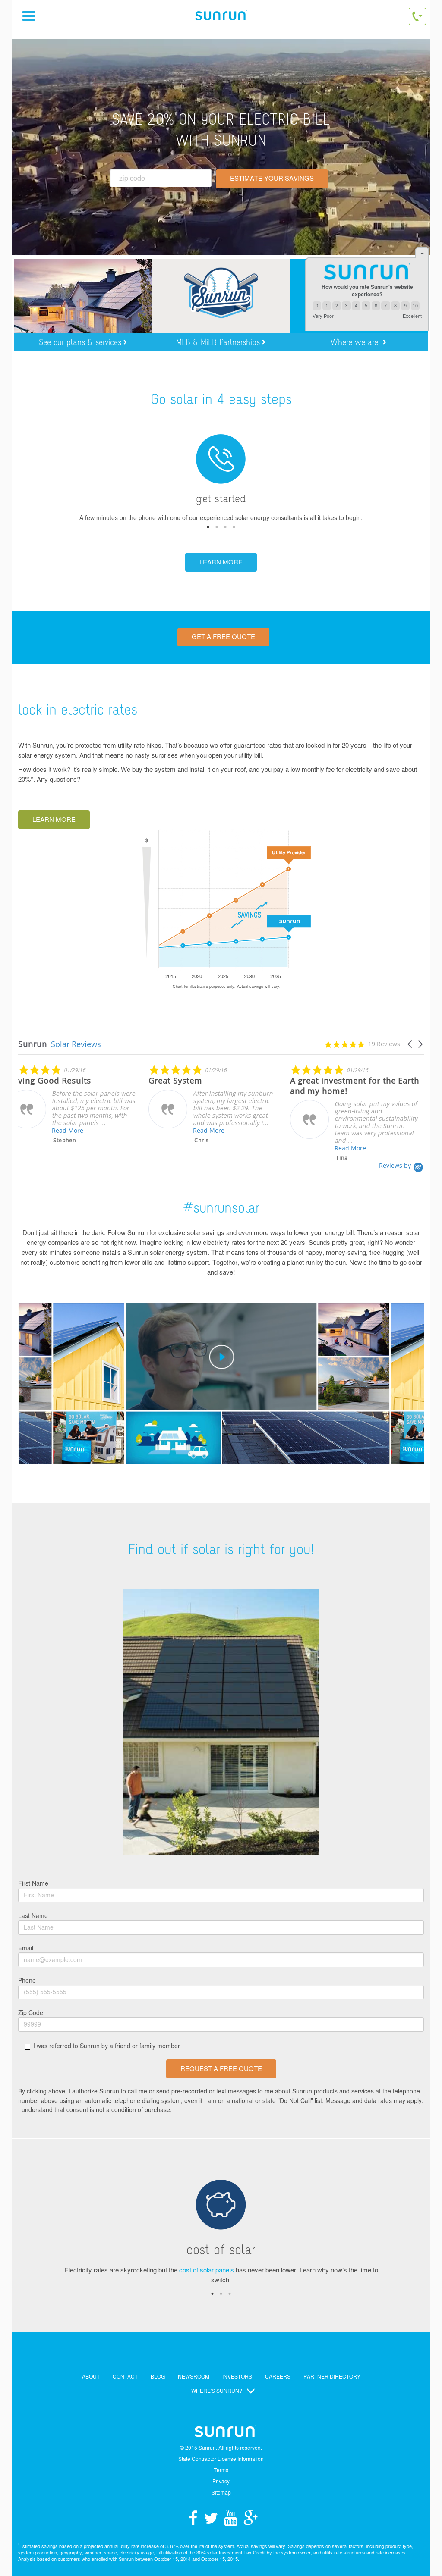 Sunrun Competitors, Revenue and Employees - Owler Company